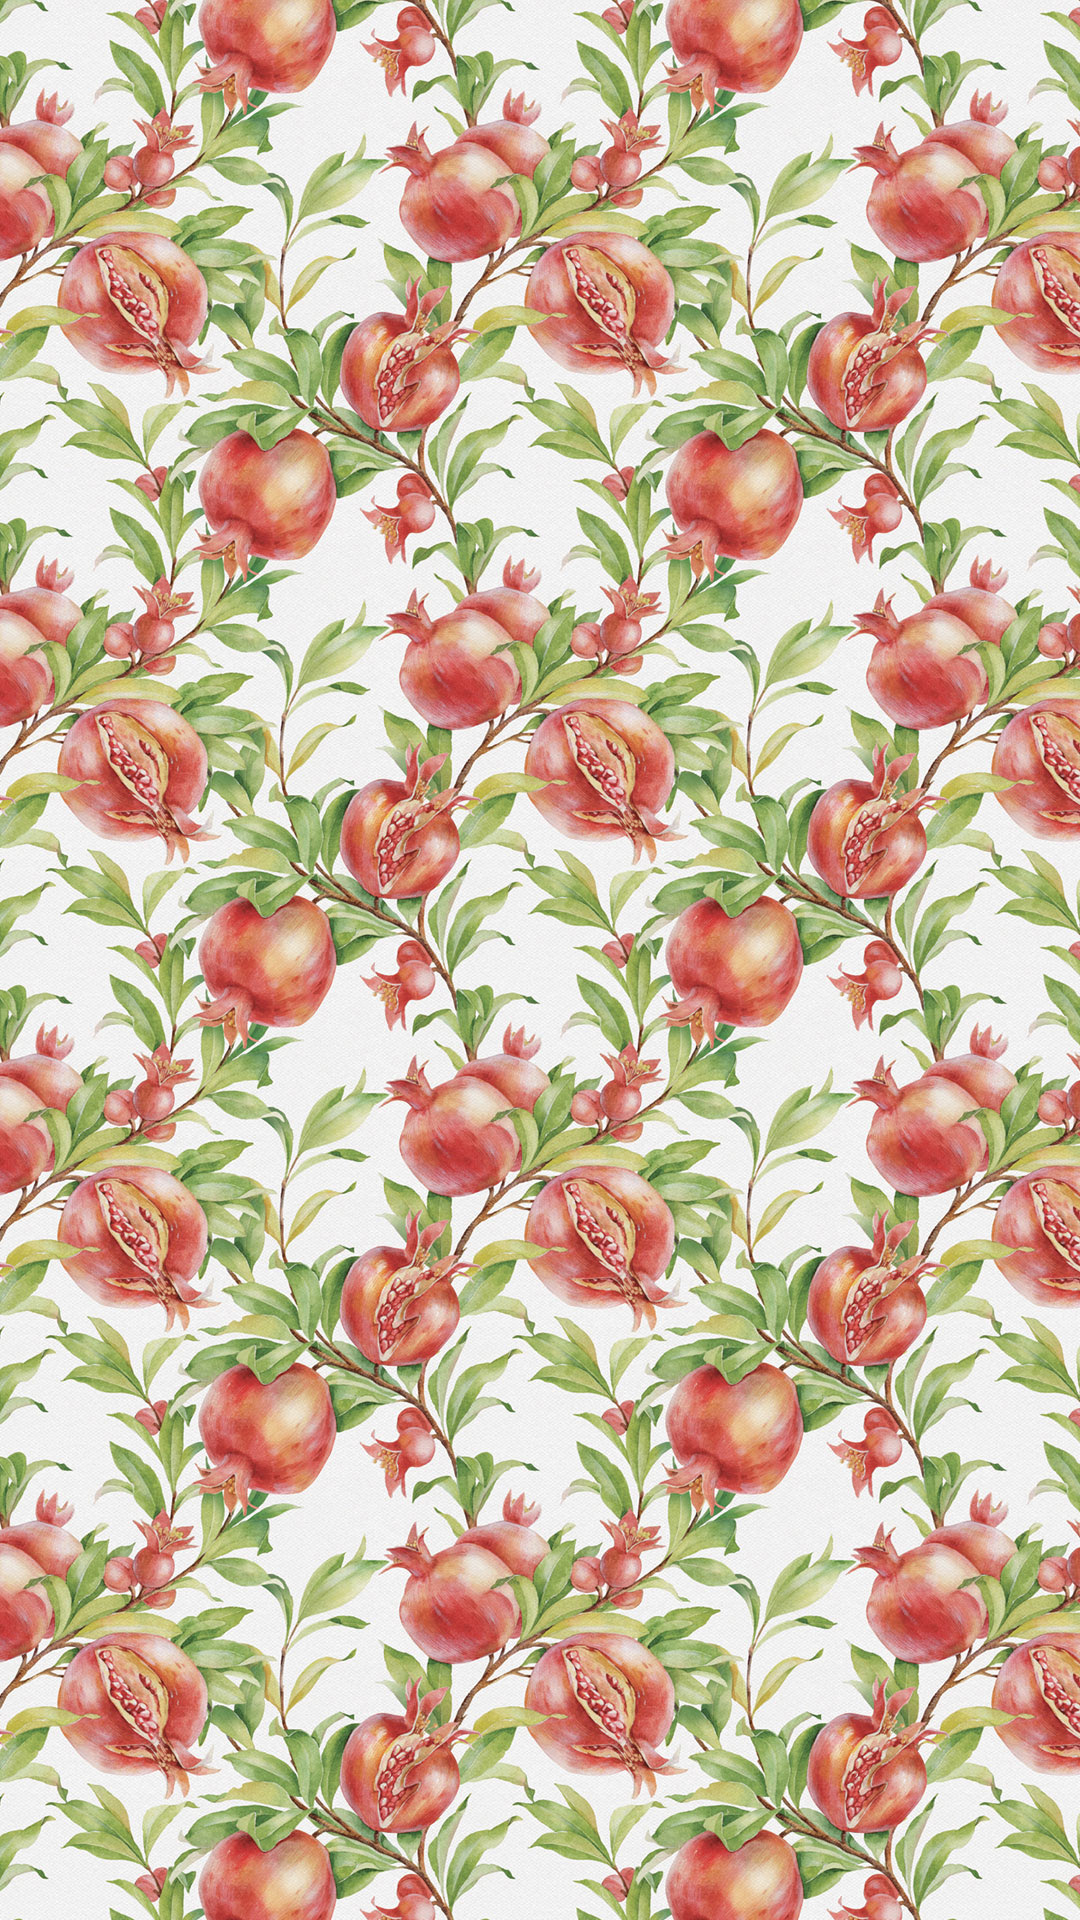 20+ Cool & Beautiful iPhone 7 Plus Wallpapers ...